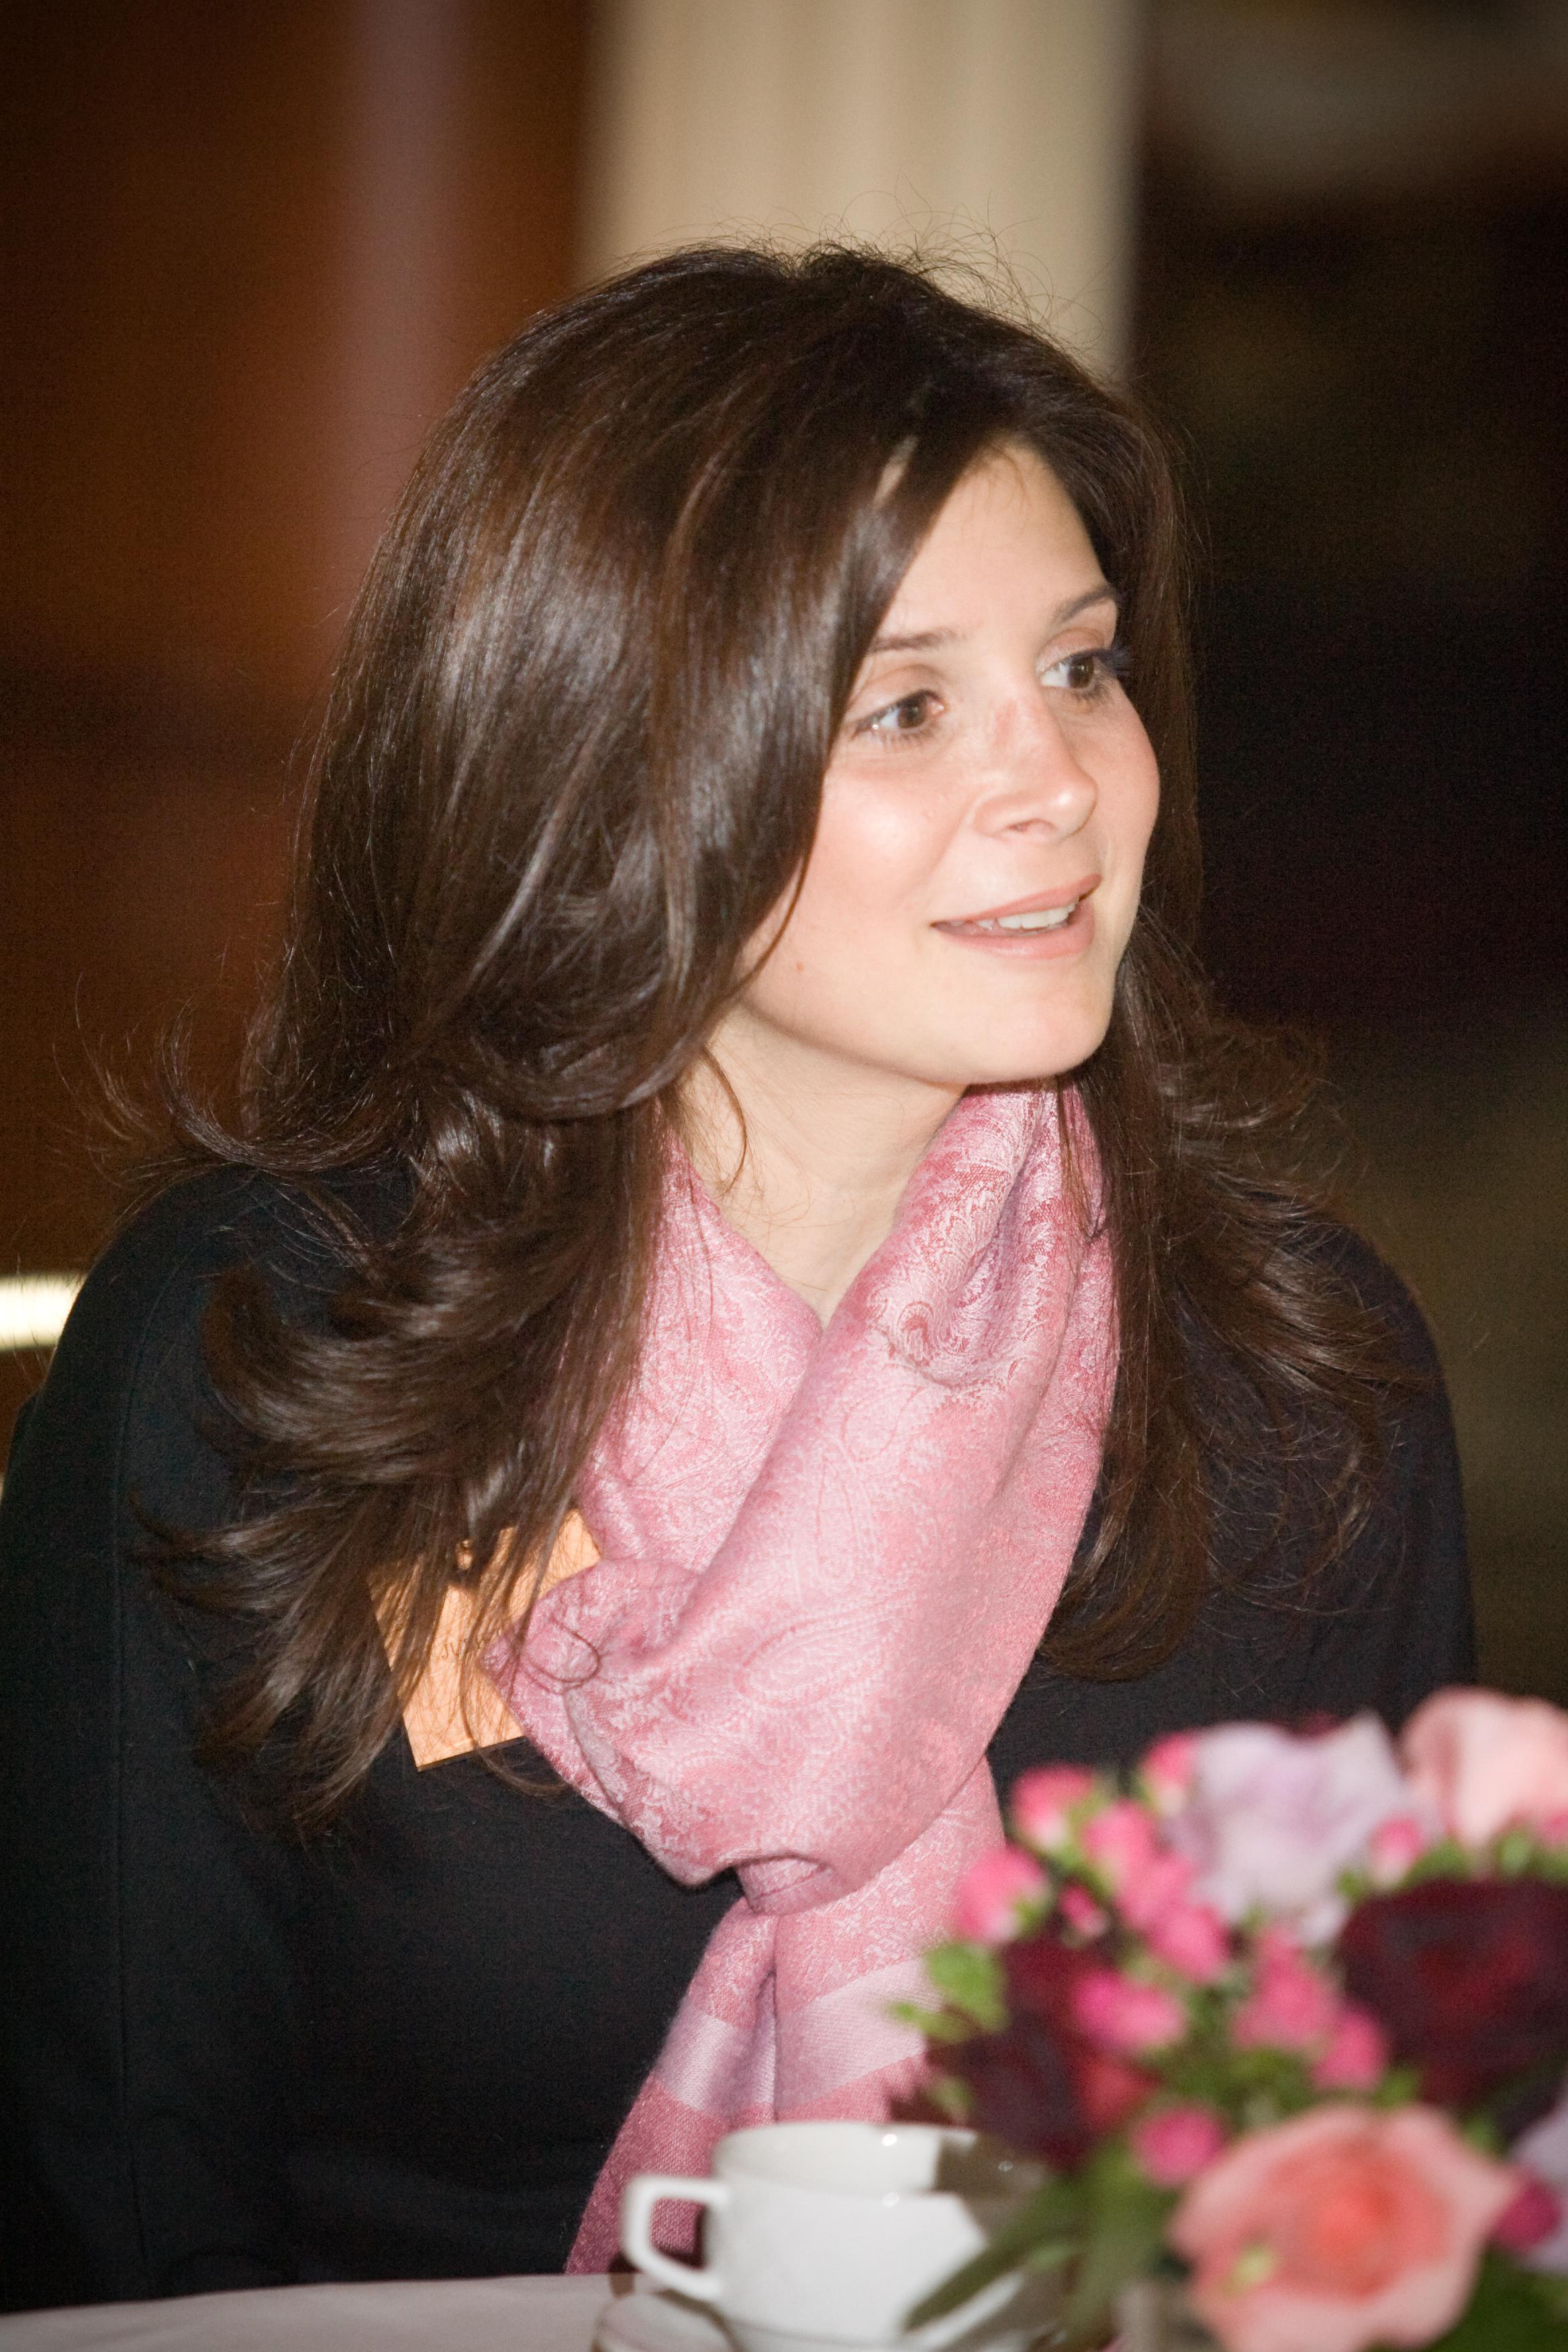 Food-ology founder and behavioral food expert, Juliet A. Boghossian